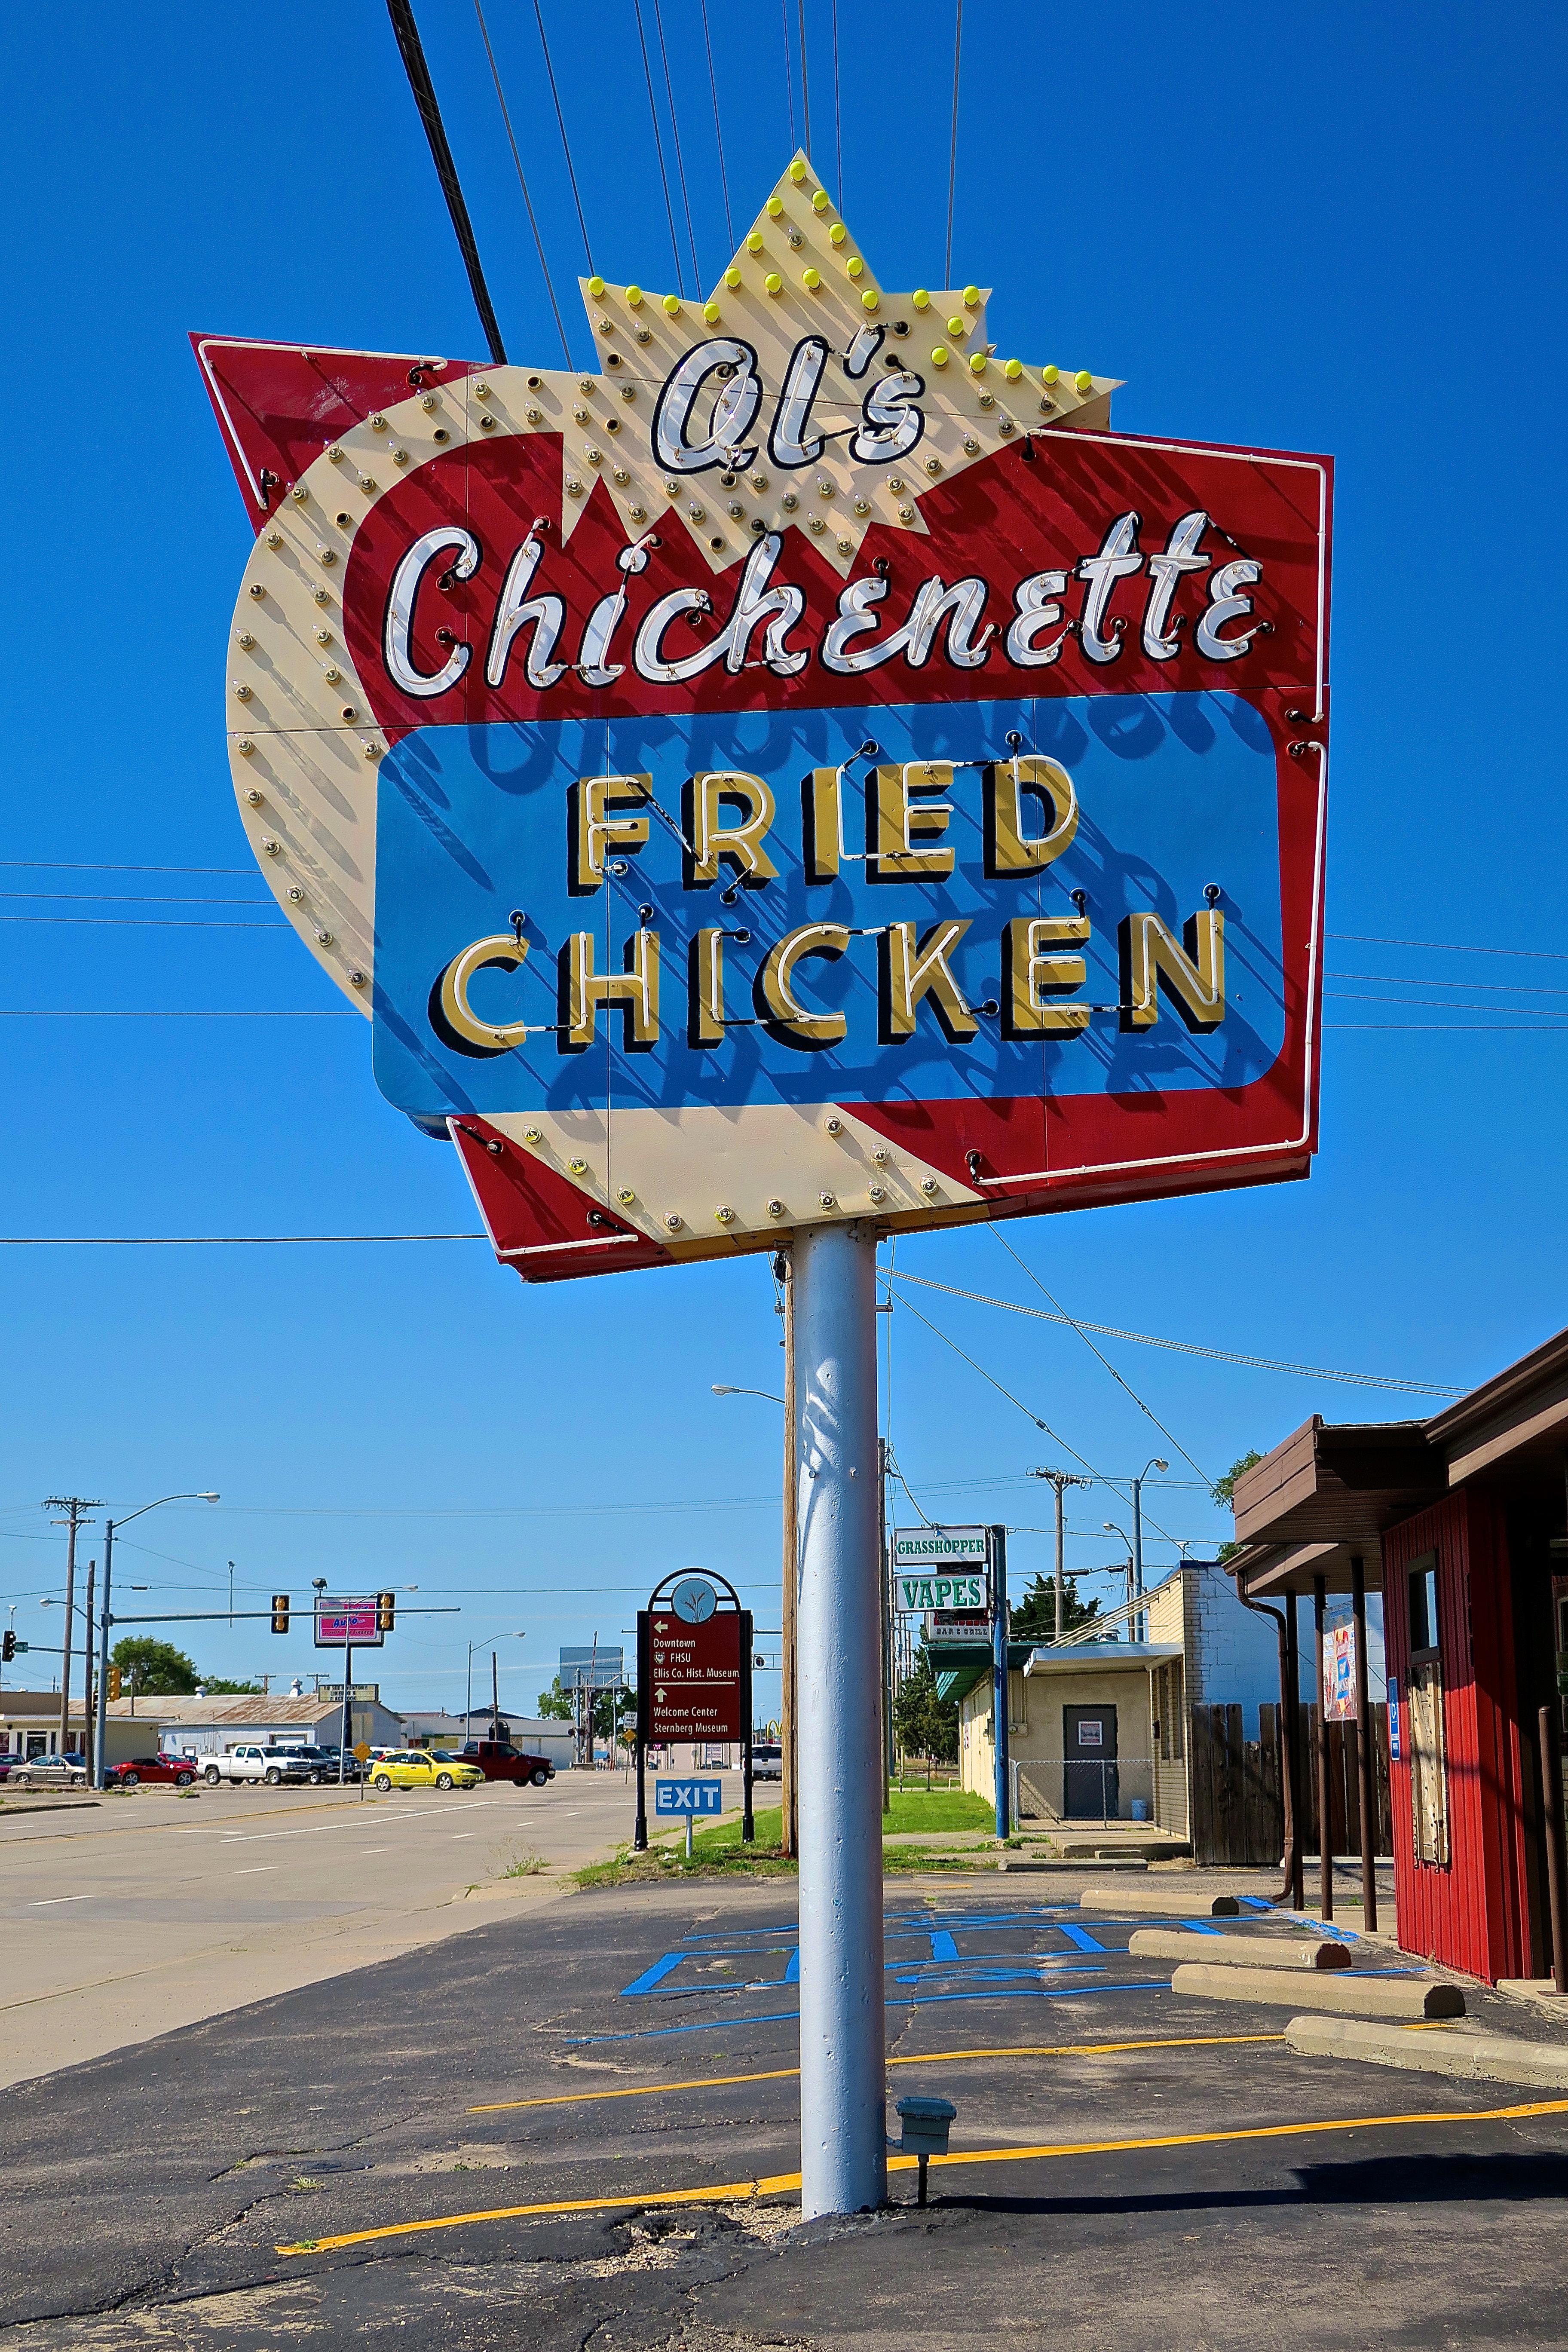 Al's Chickenette - 700 Vine Street, Hays, Kansas U.S.A. - July 4, 2016